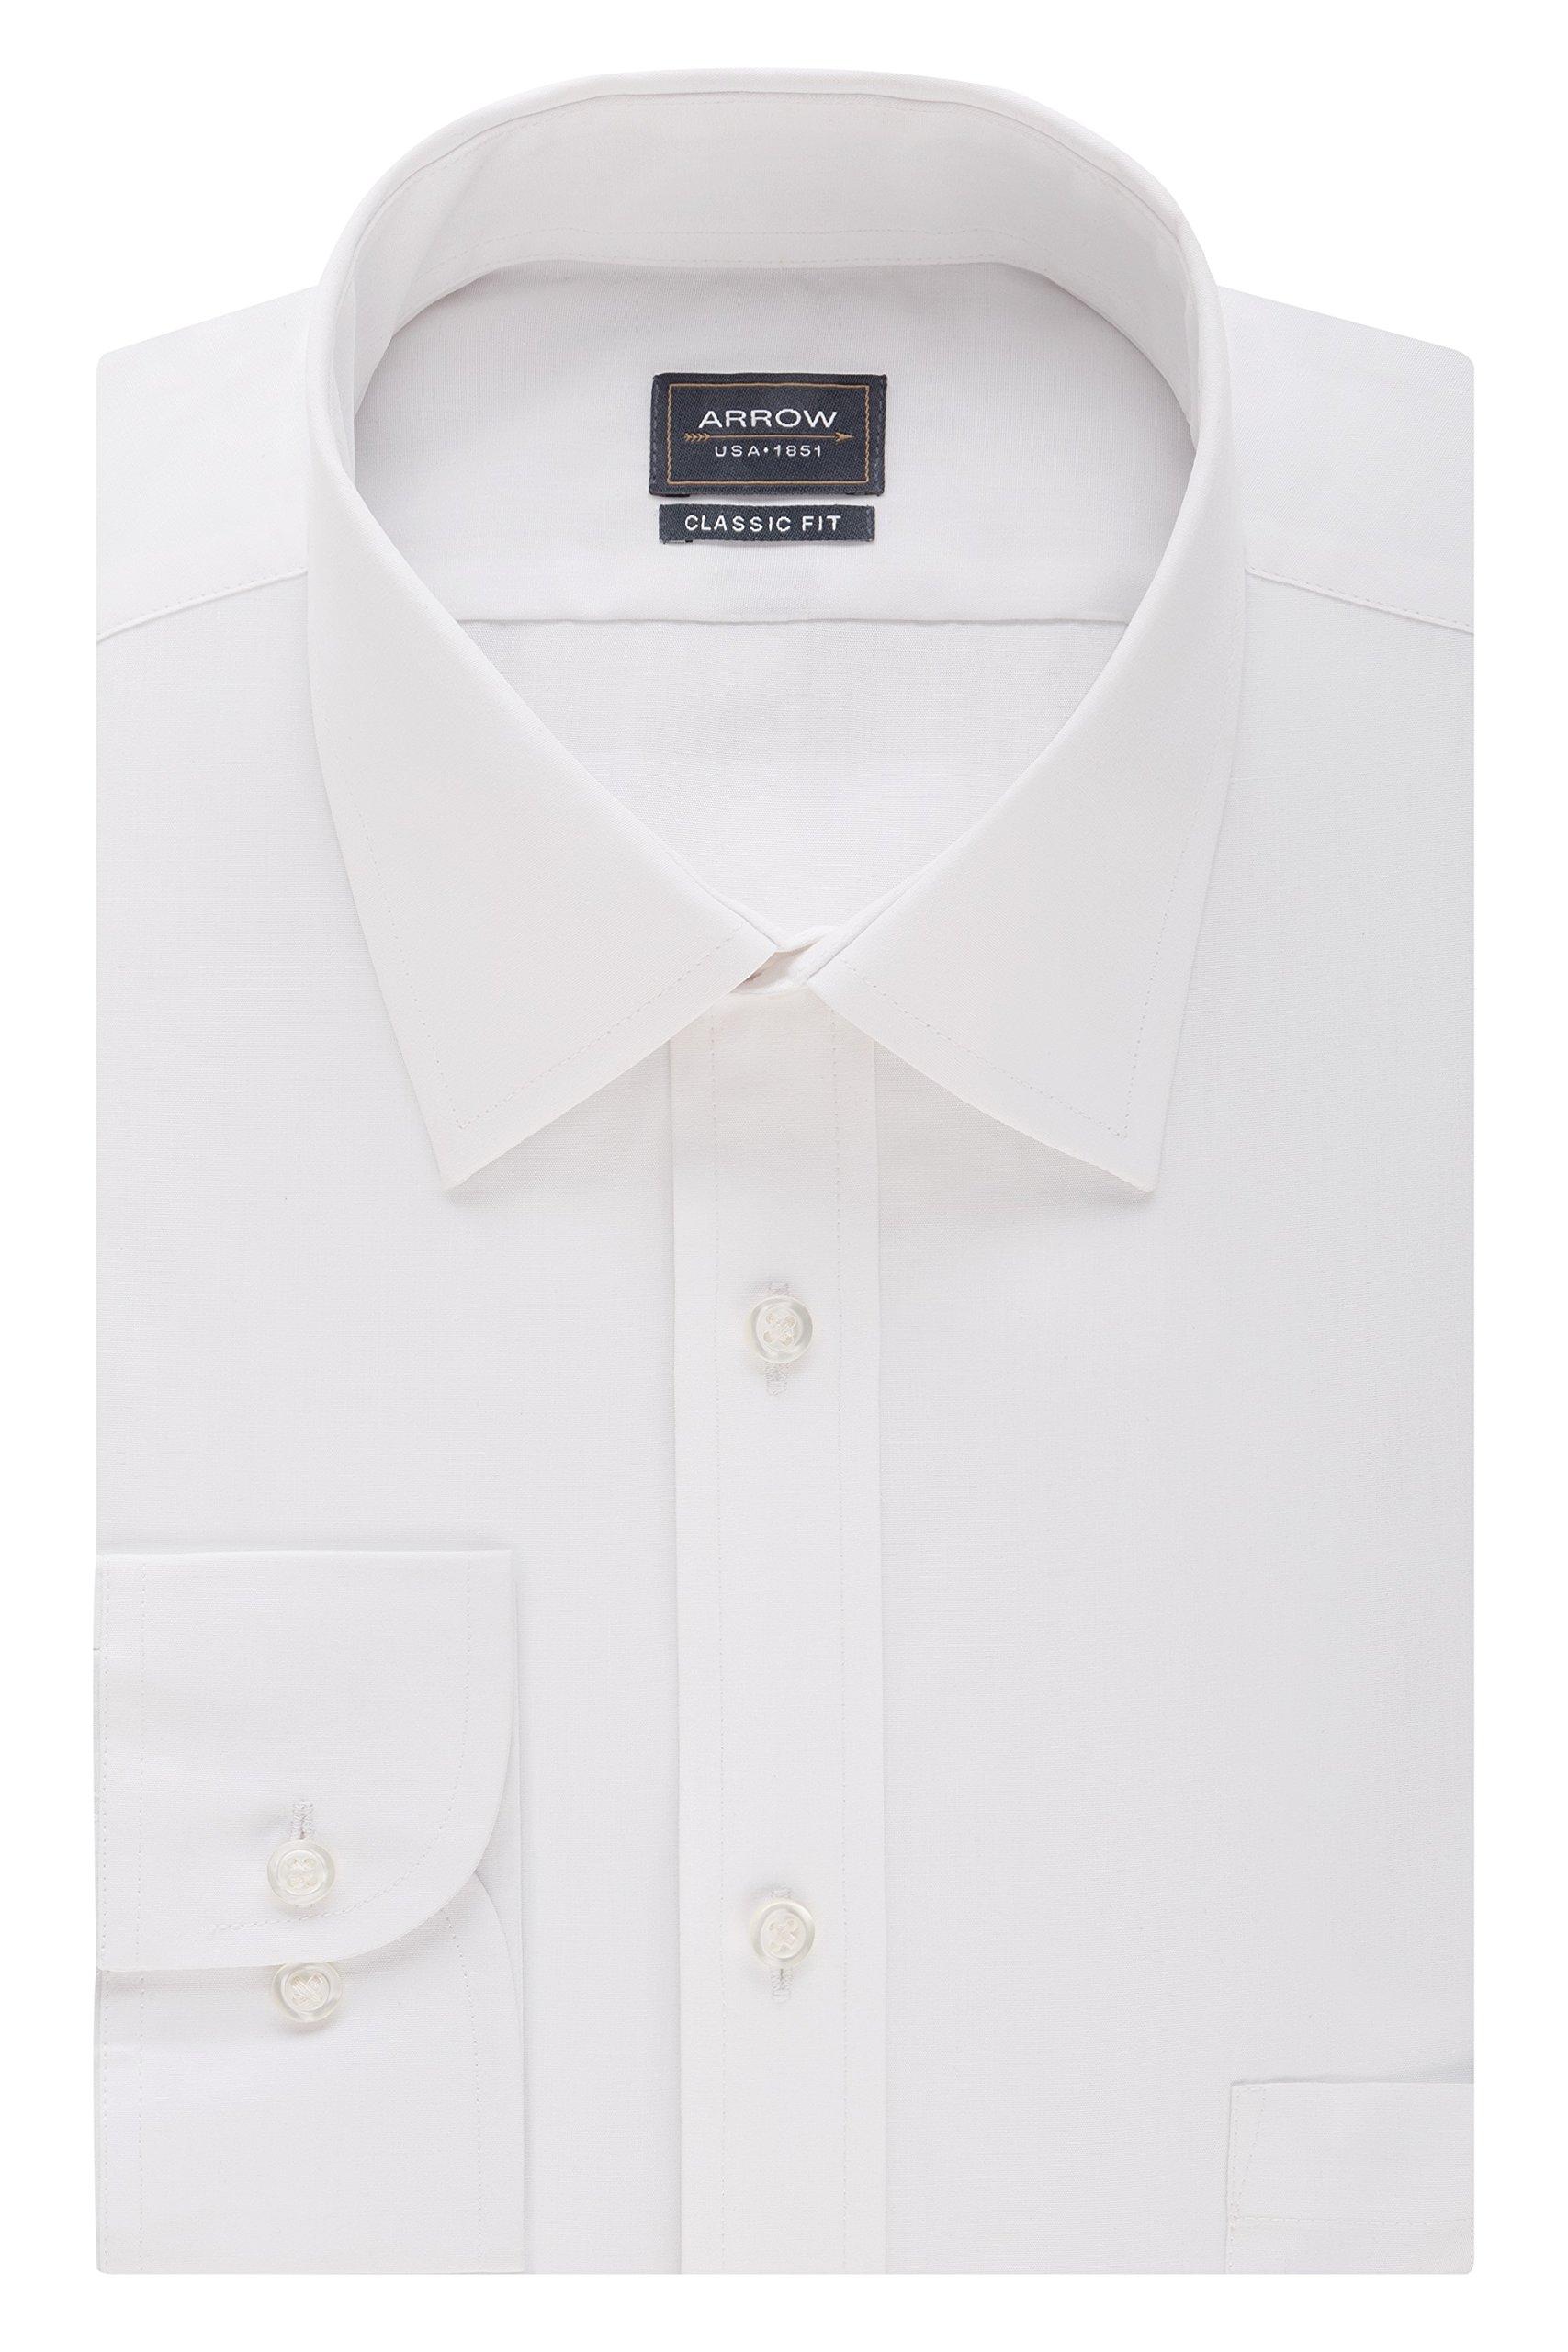 Arrow Men's Poplin Regular Fit Solid Spread Collar Dress Shirt, White, 18-18.5'' Neck 36''-37'' Sleeve